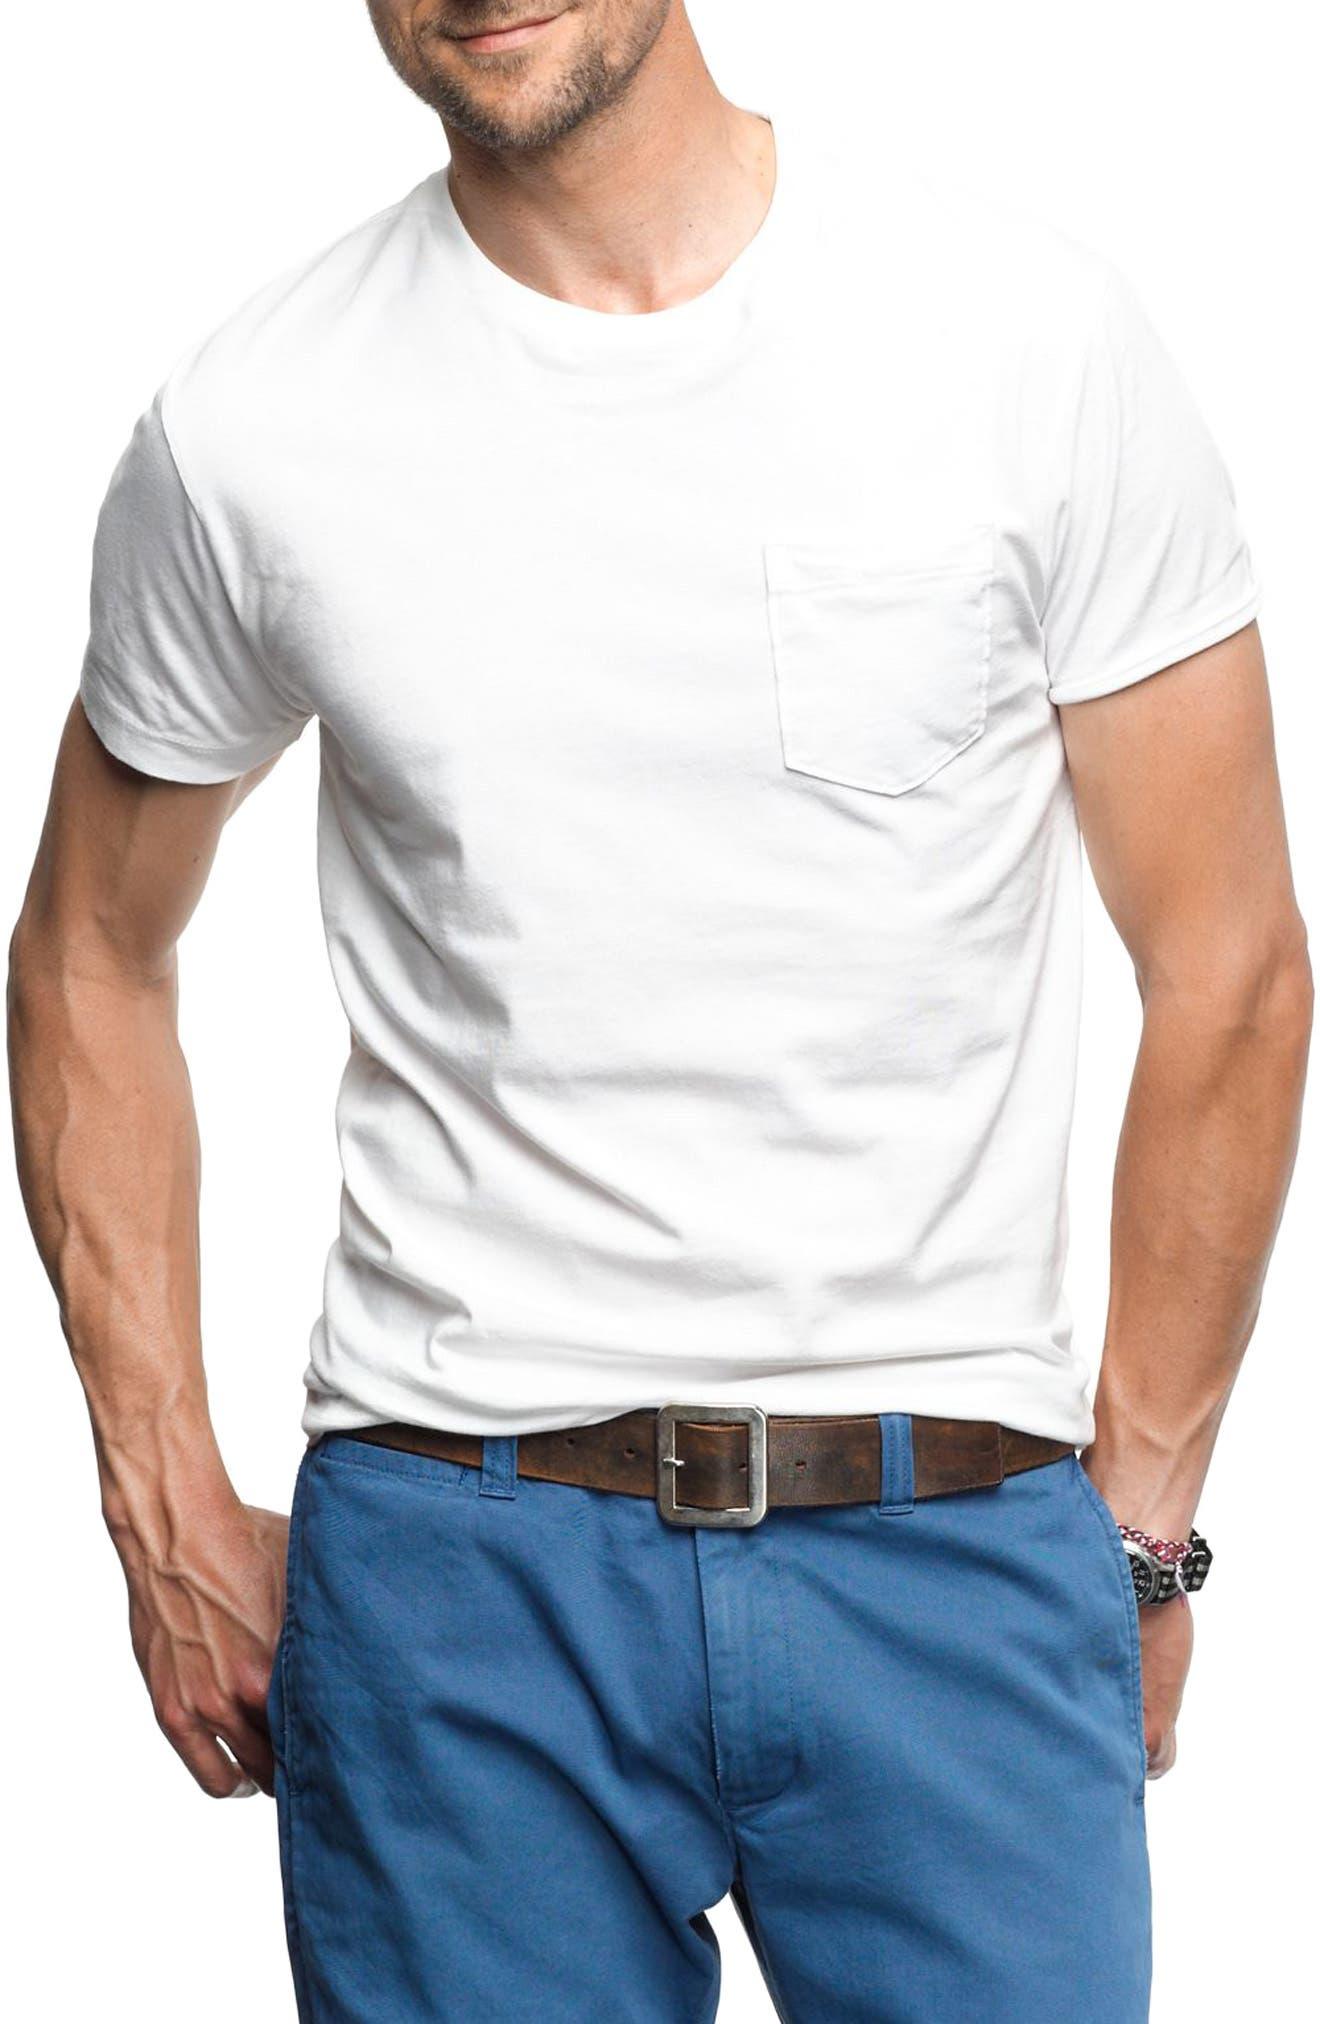 Main Image - J.Crew Slim Fit Broken-In Pocket T-Shirt